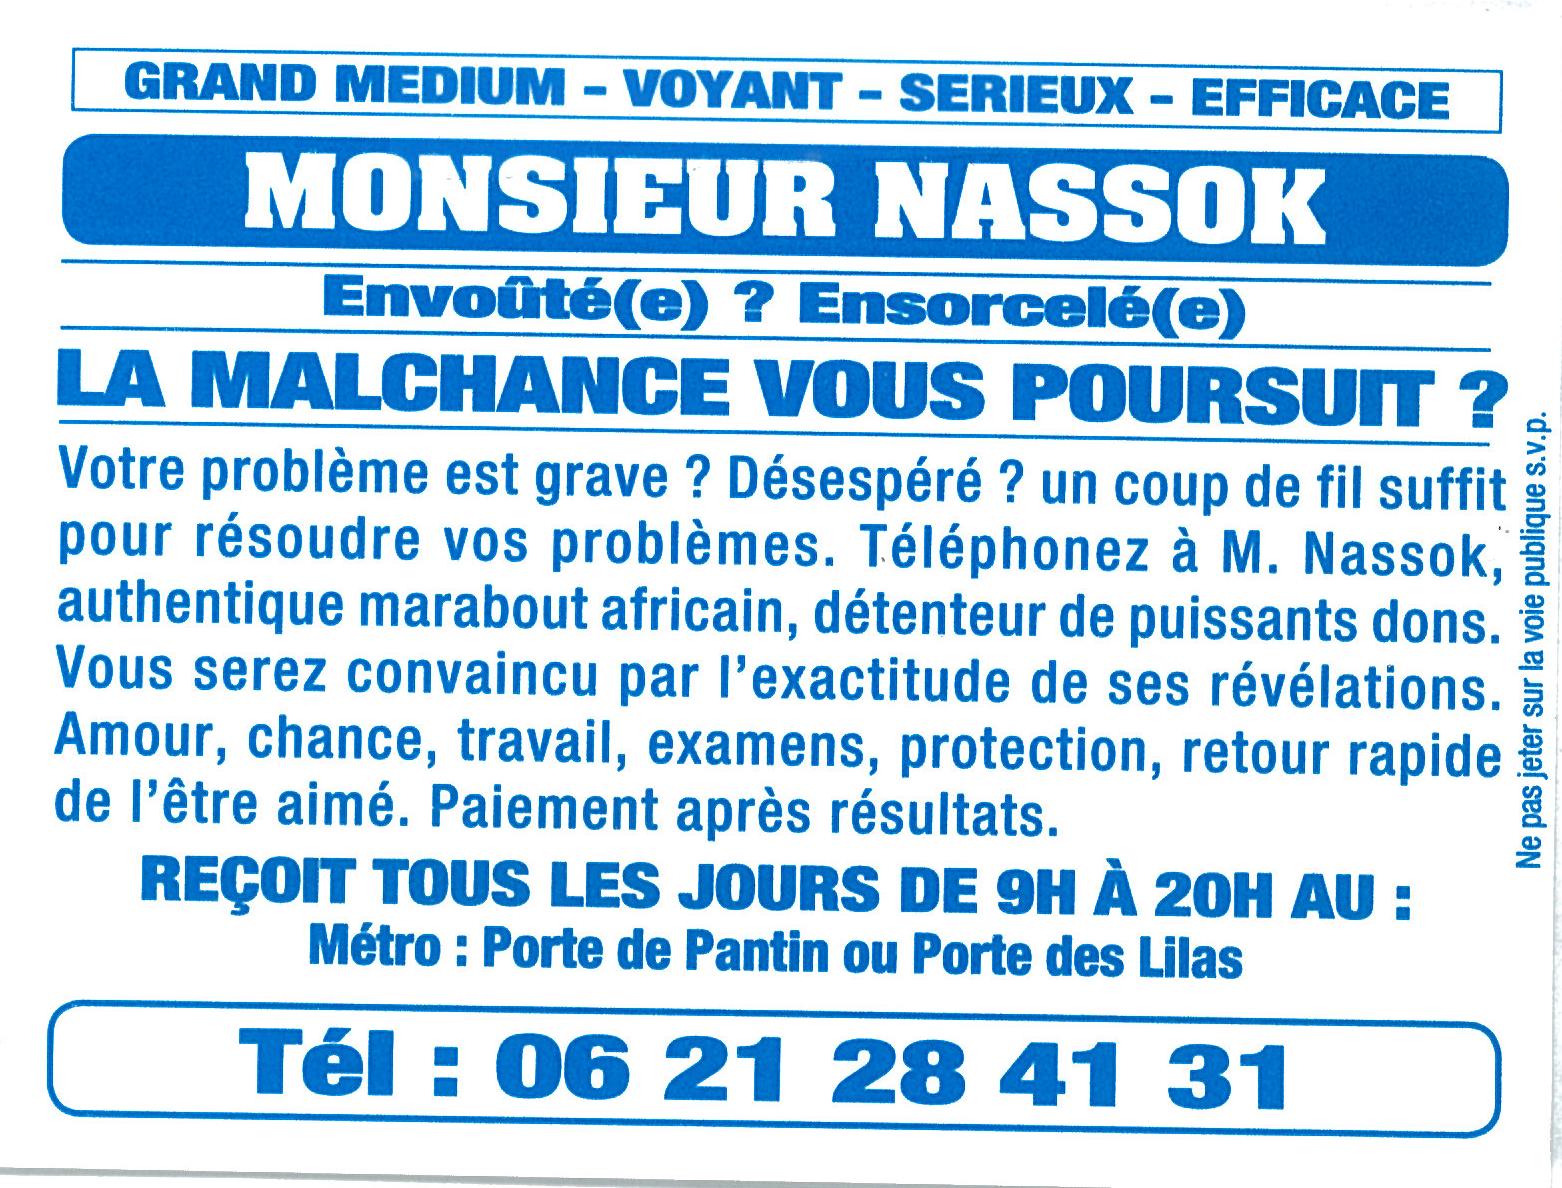 Monsieur Nassok